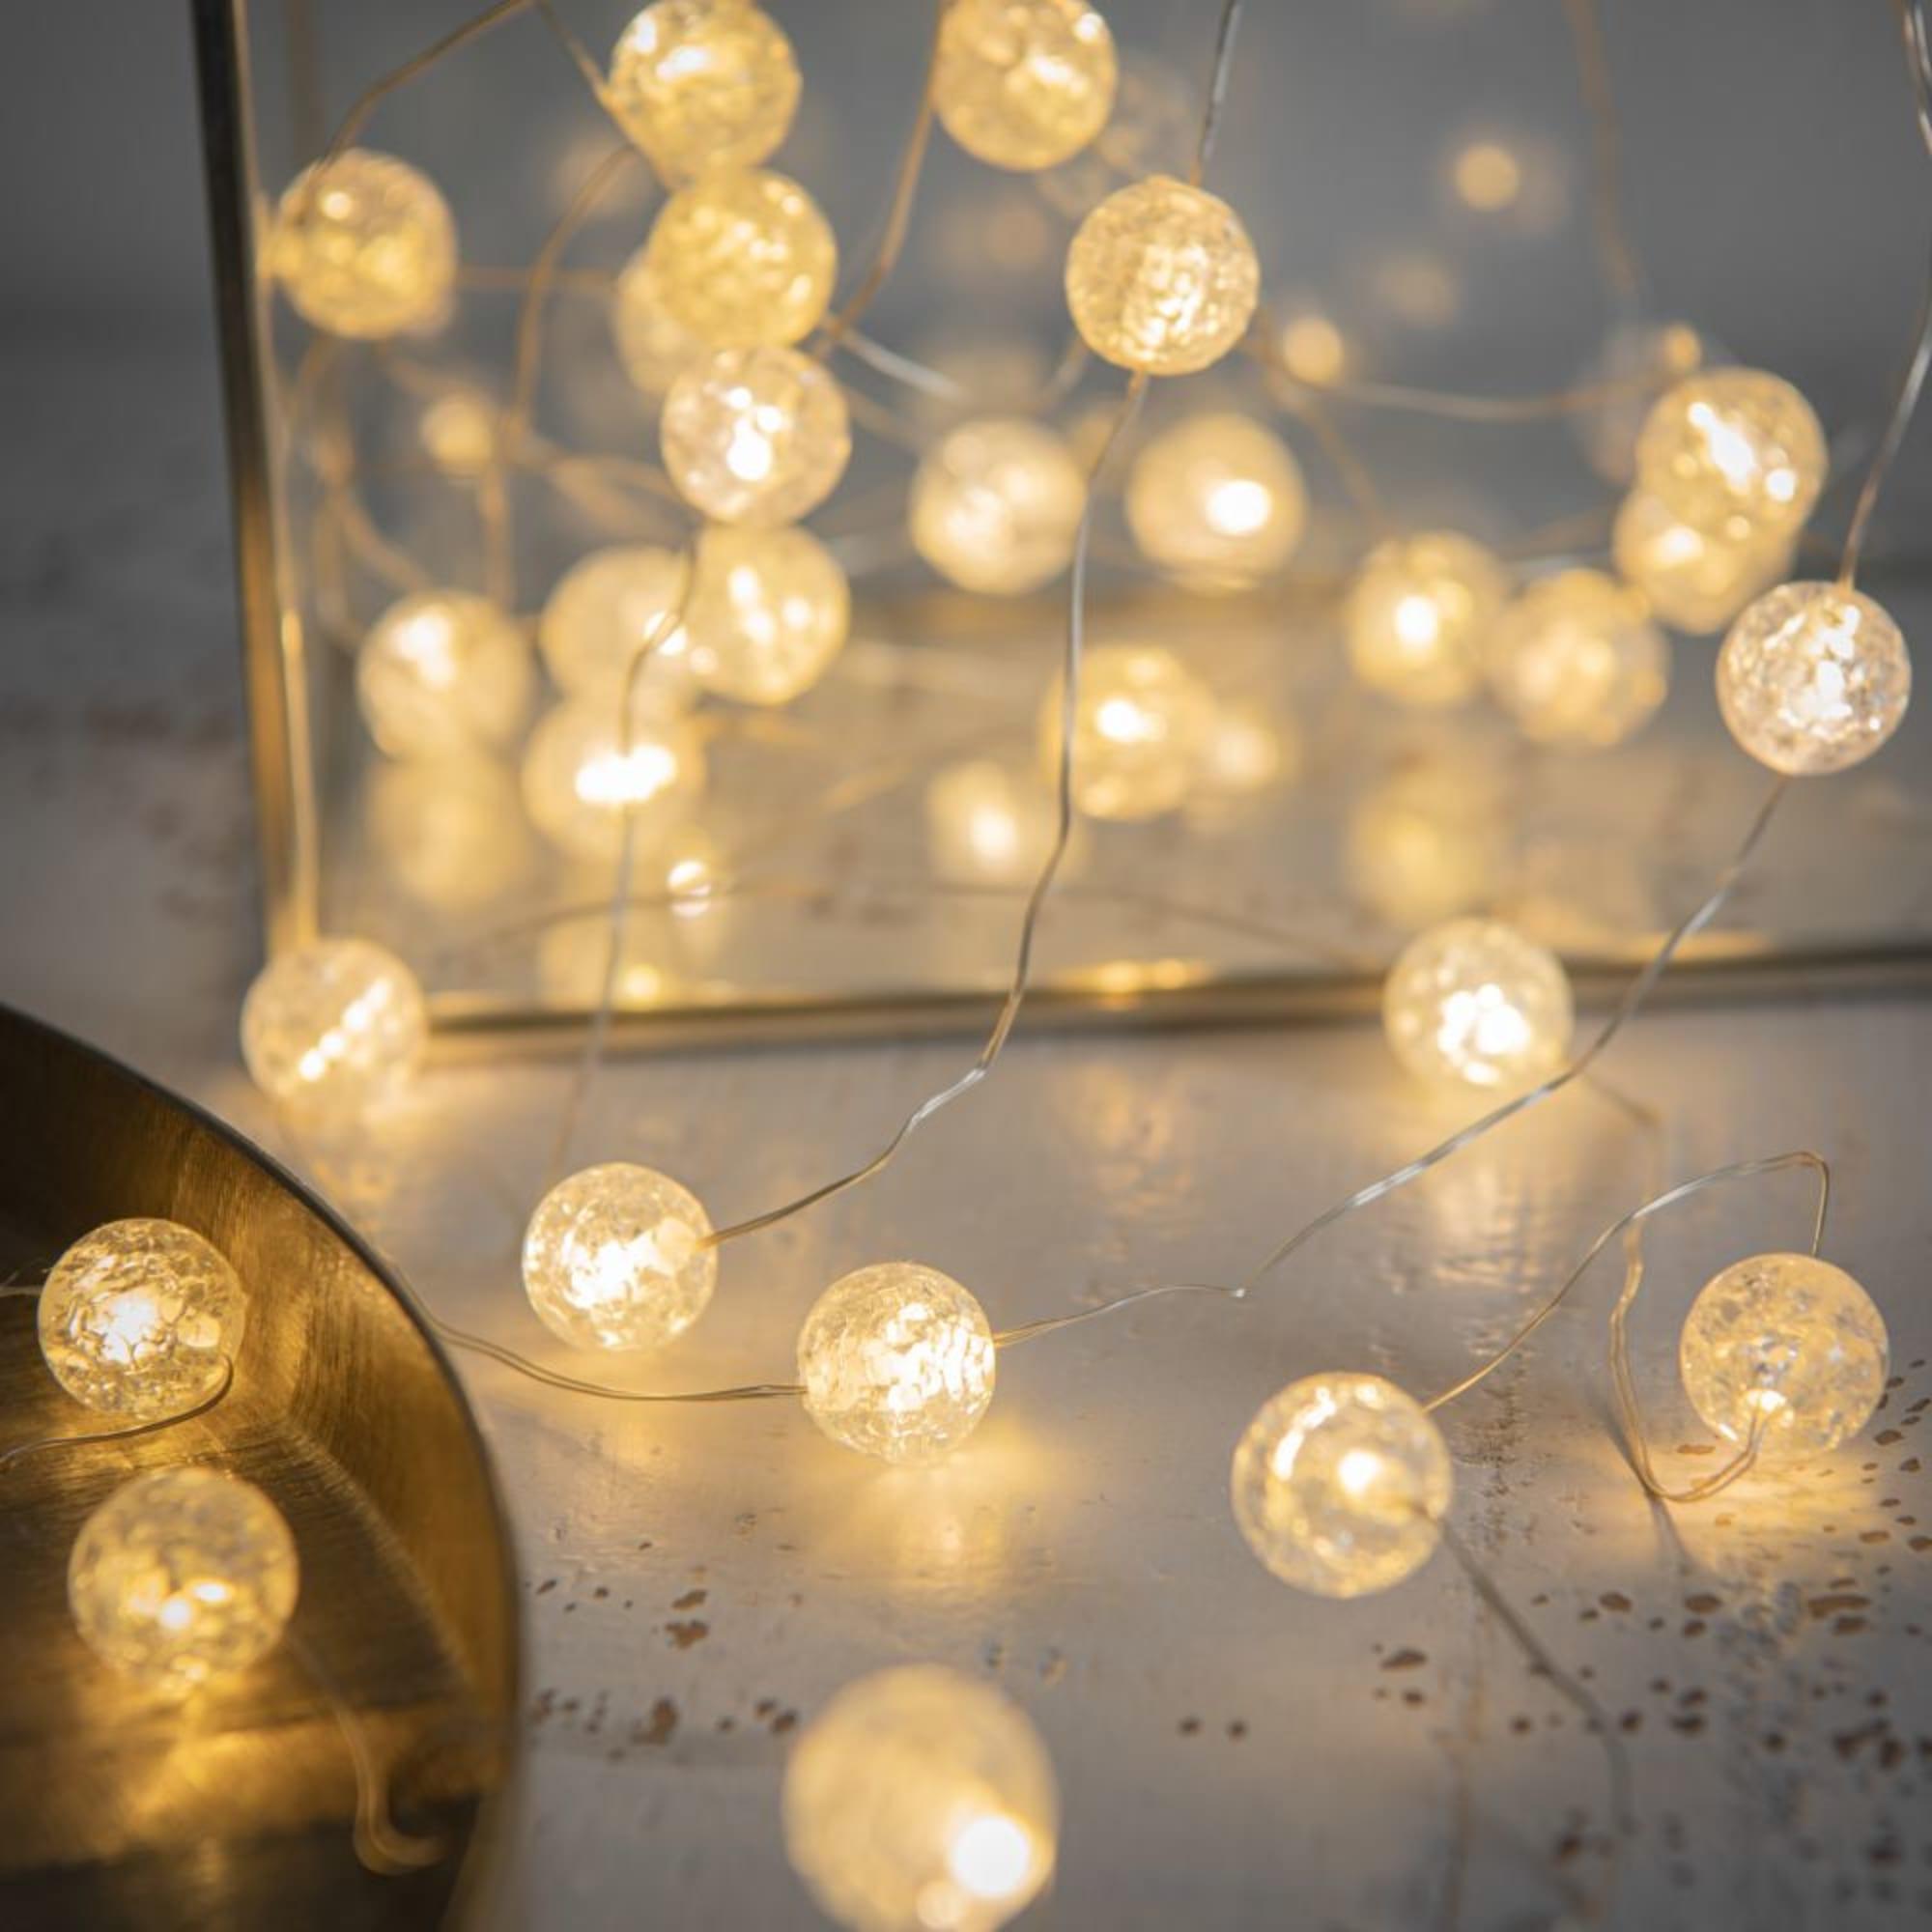 Luminaire Maison du monde - Guirlande lumineuse 30 LED boules blanches L320